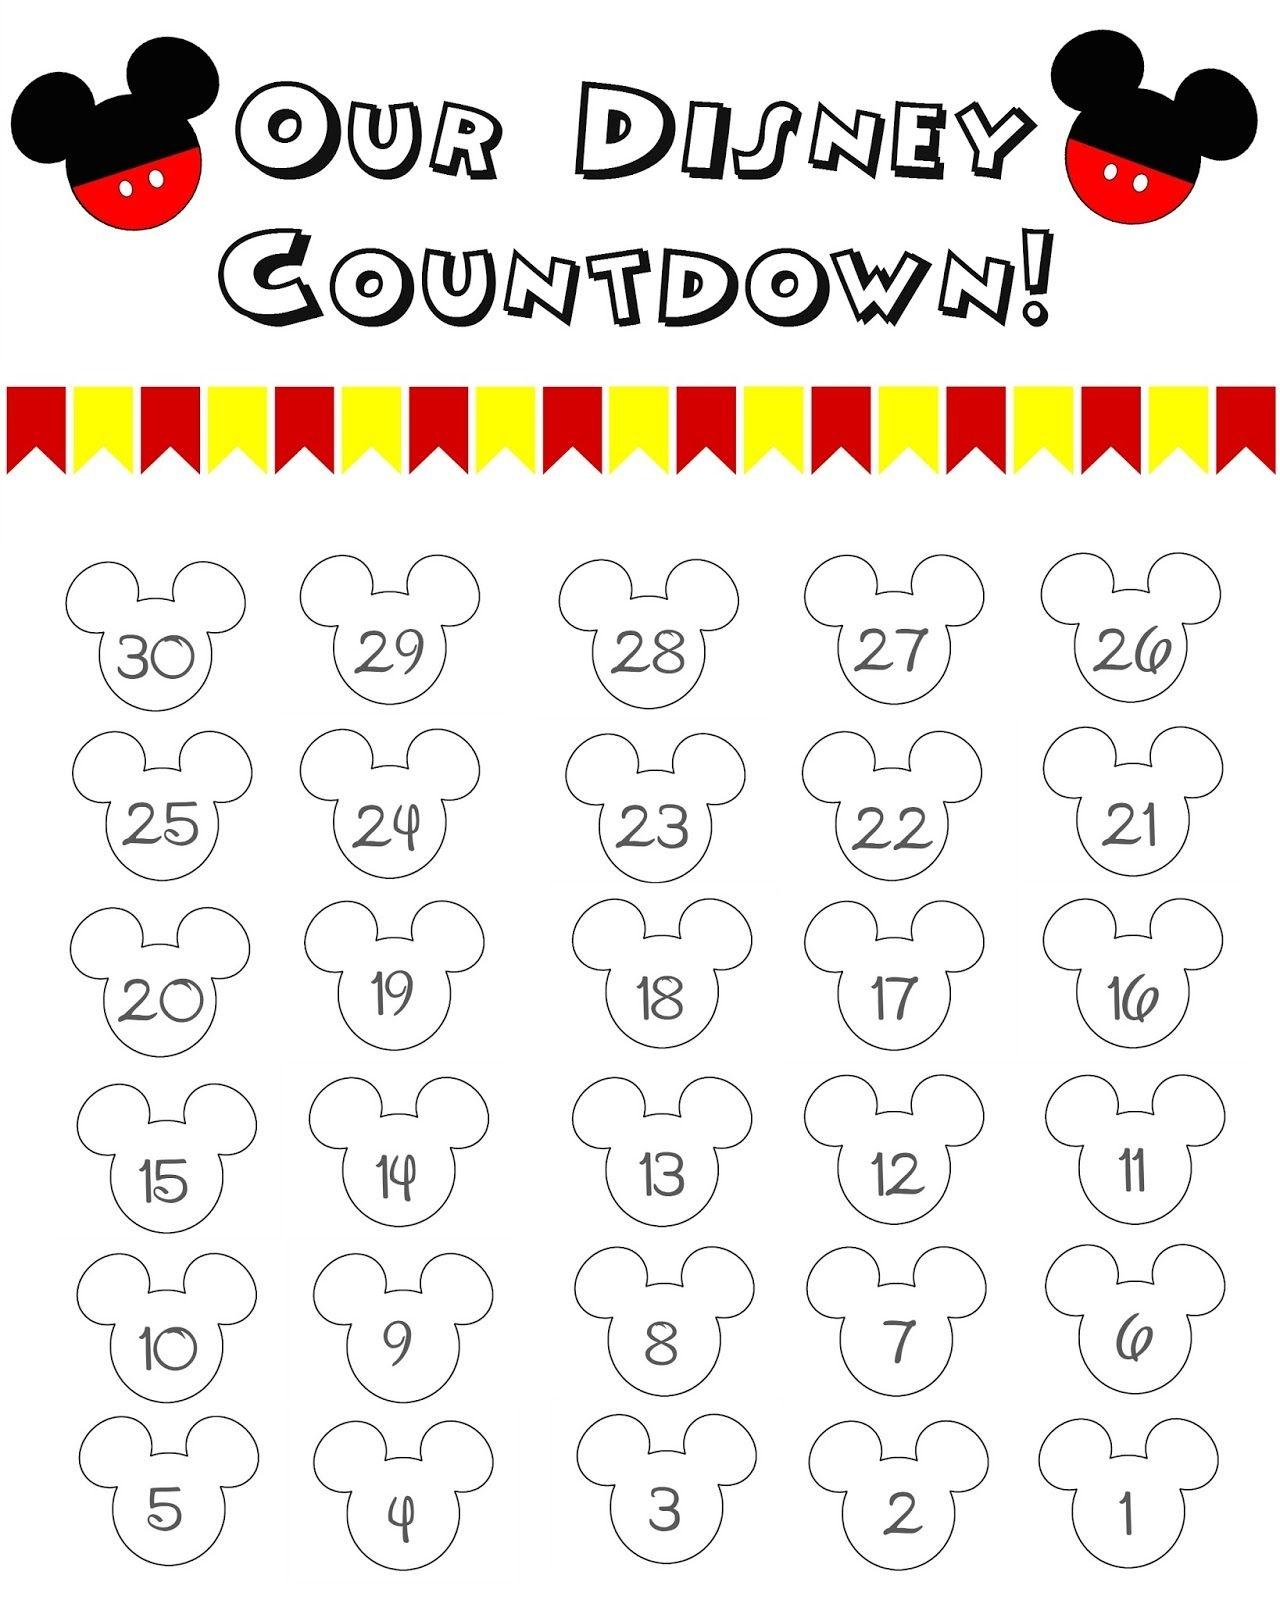 Printable Walt Disney World Countdown Calendar | Isacl